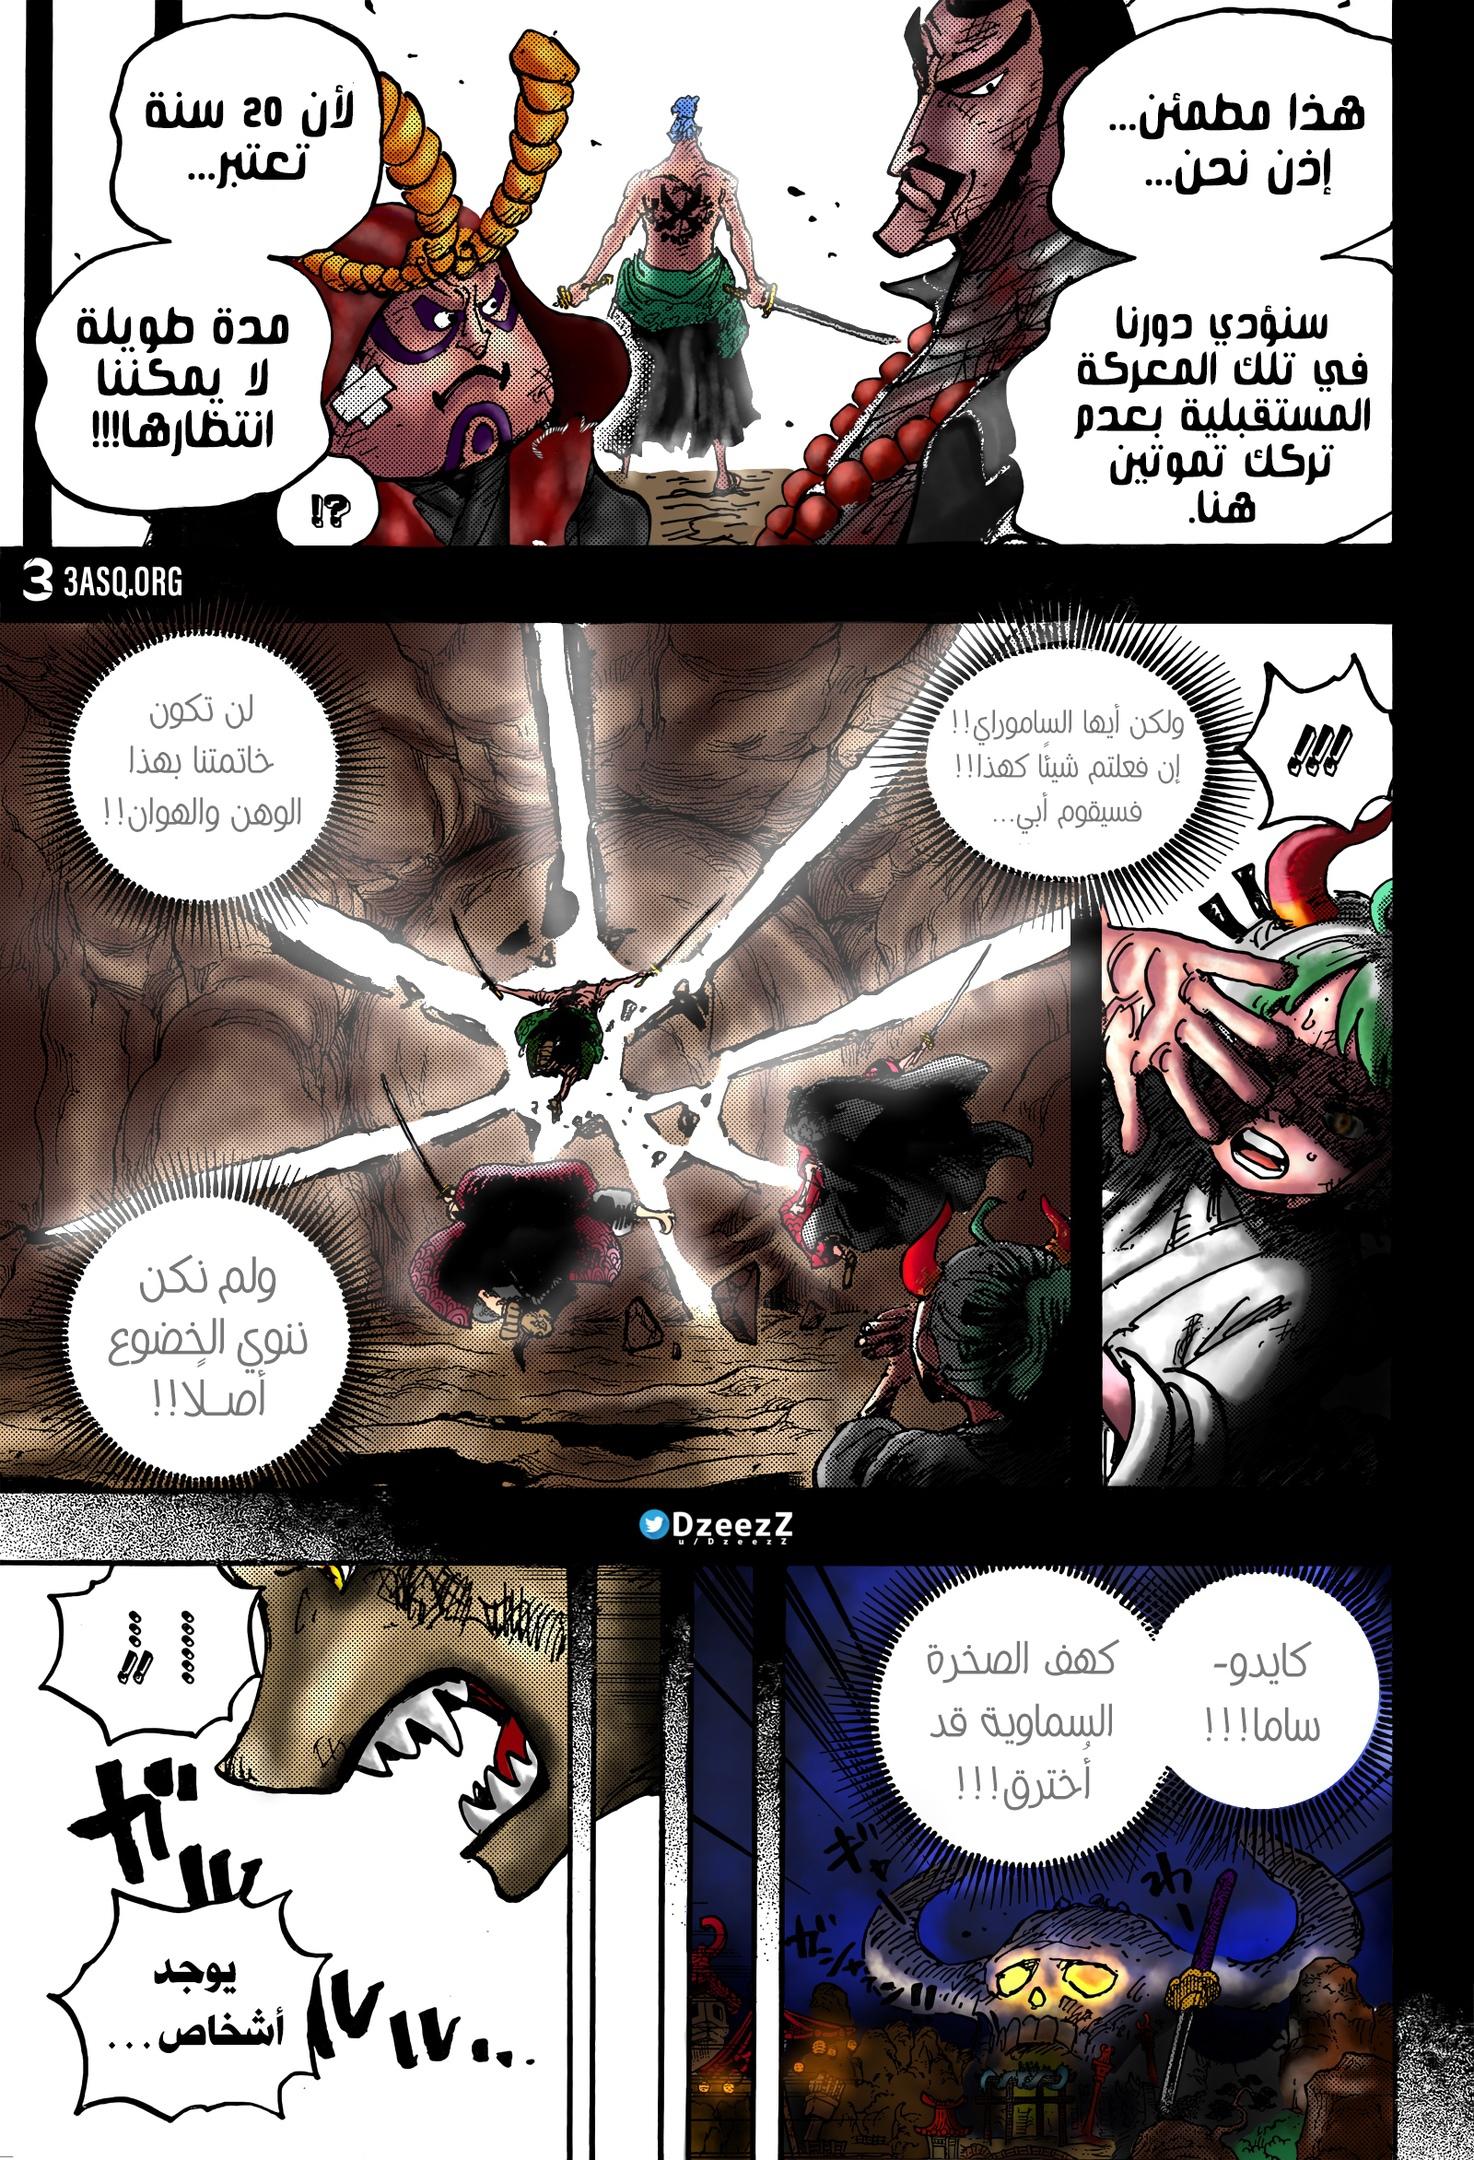 One Piece Arab 1024, image №24